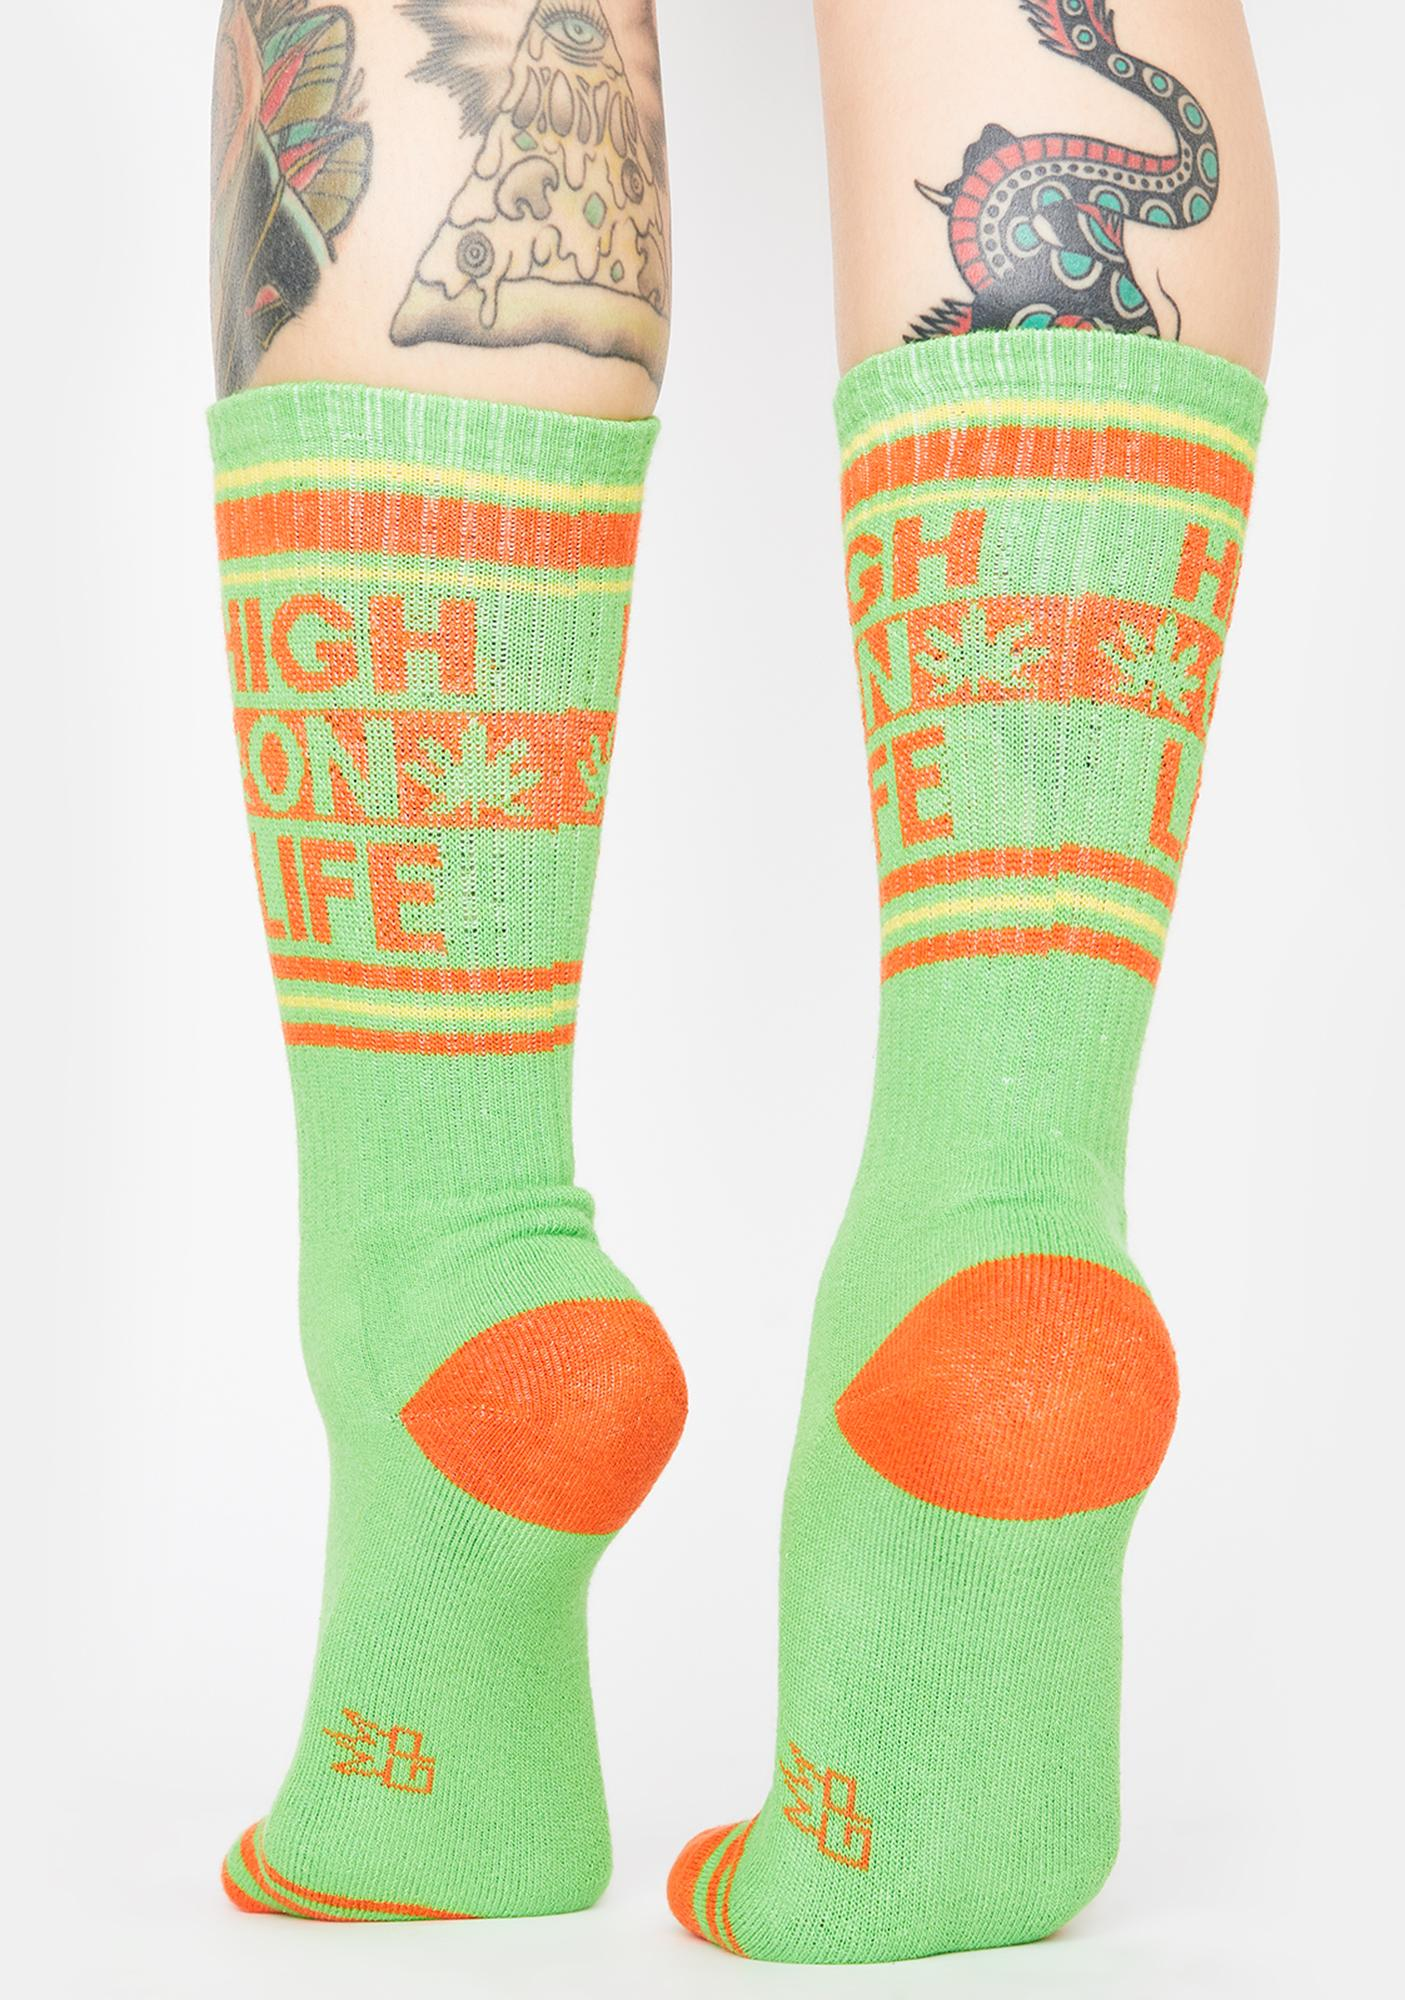 Gumball Poodle High On Life Crew Socks